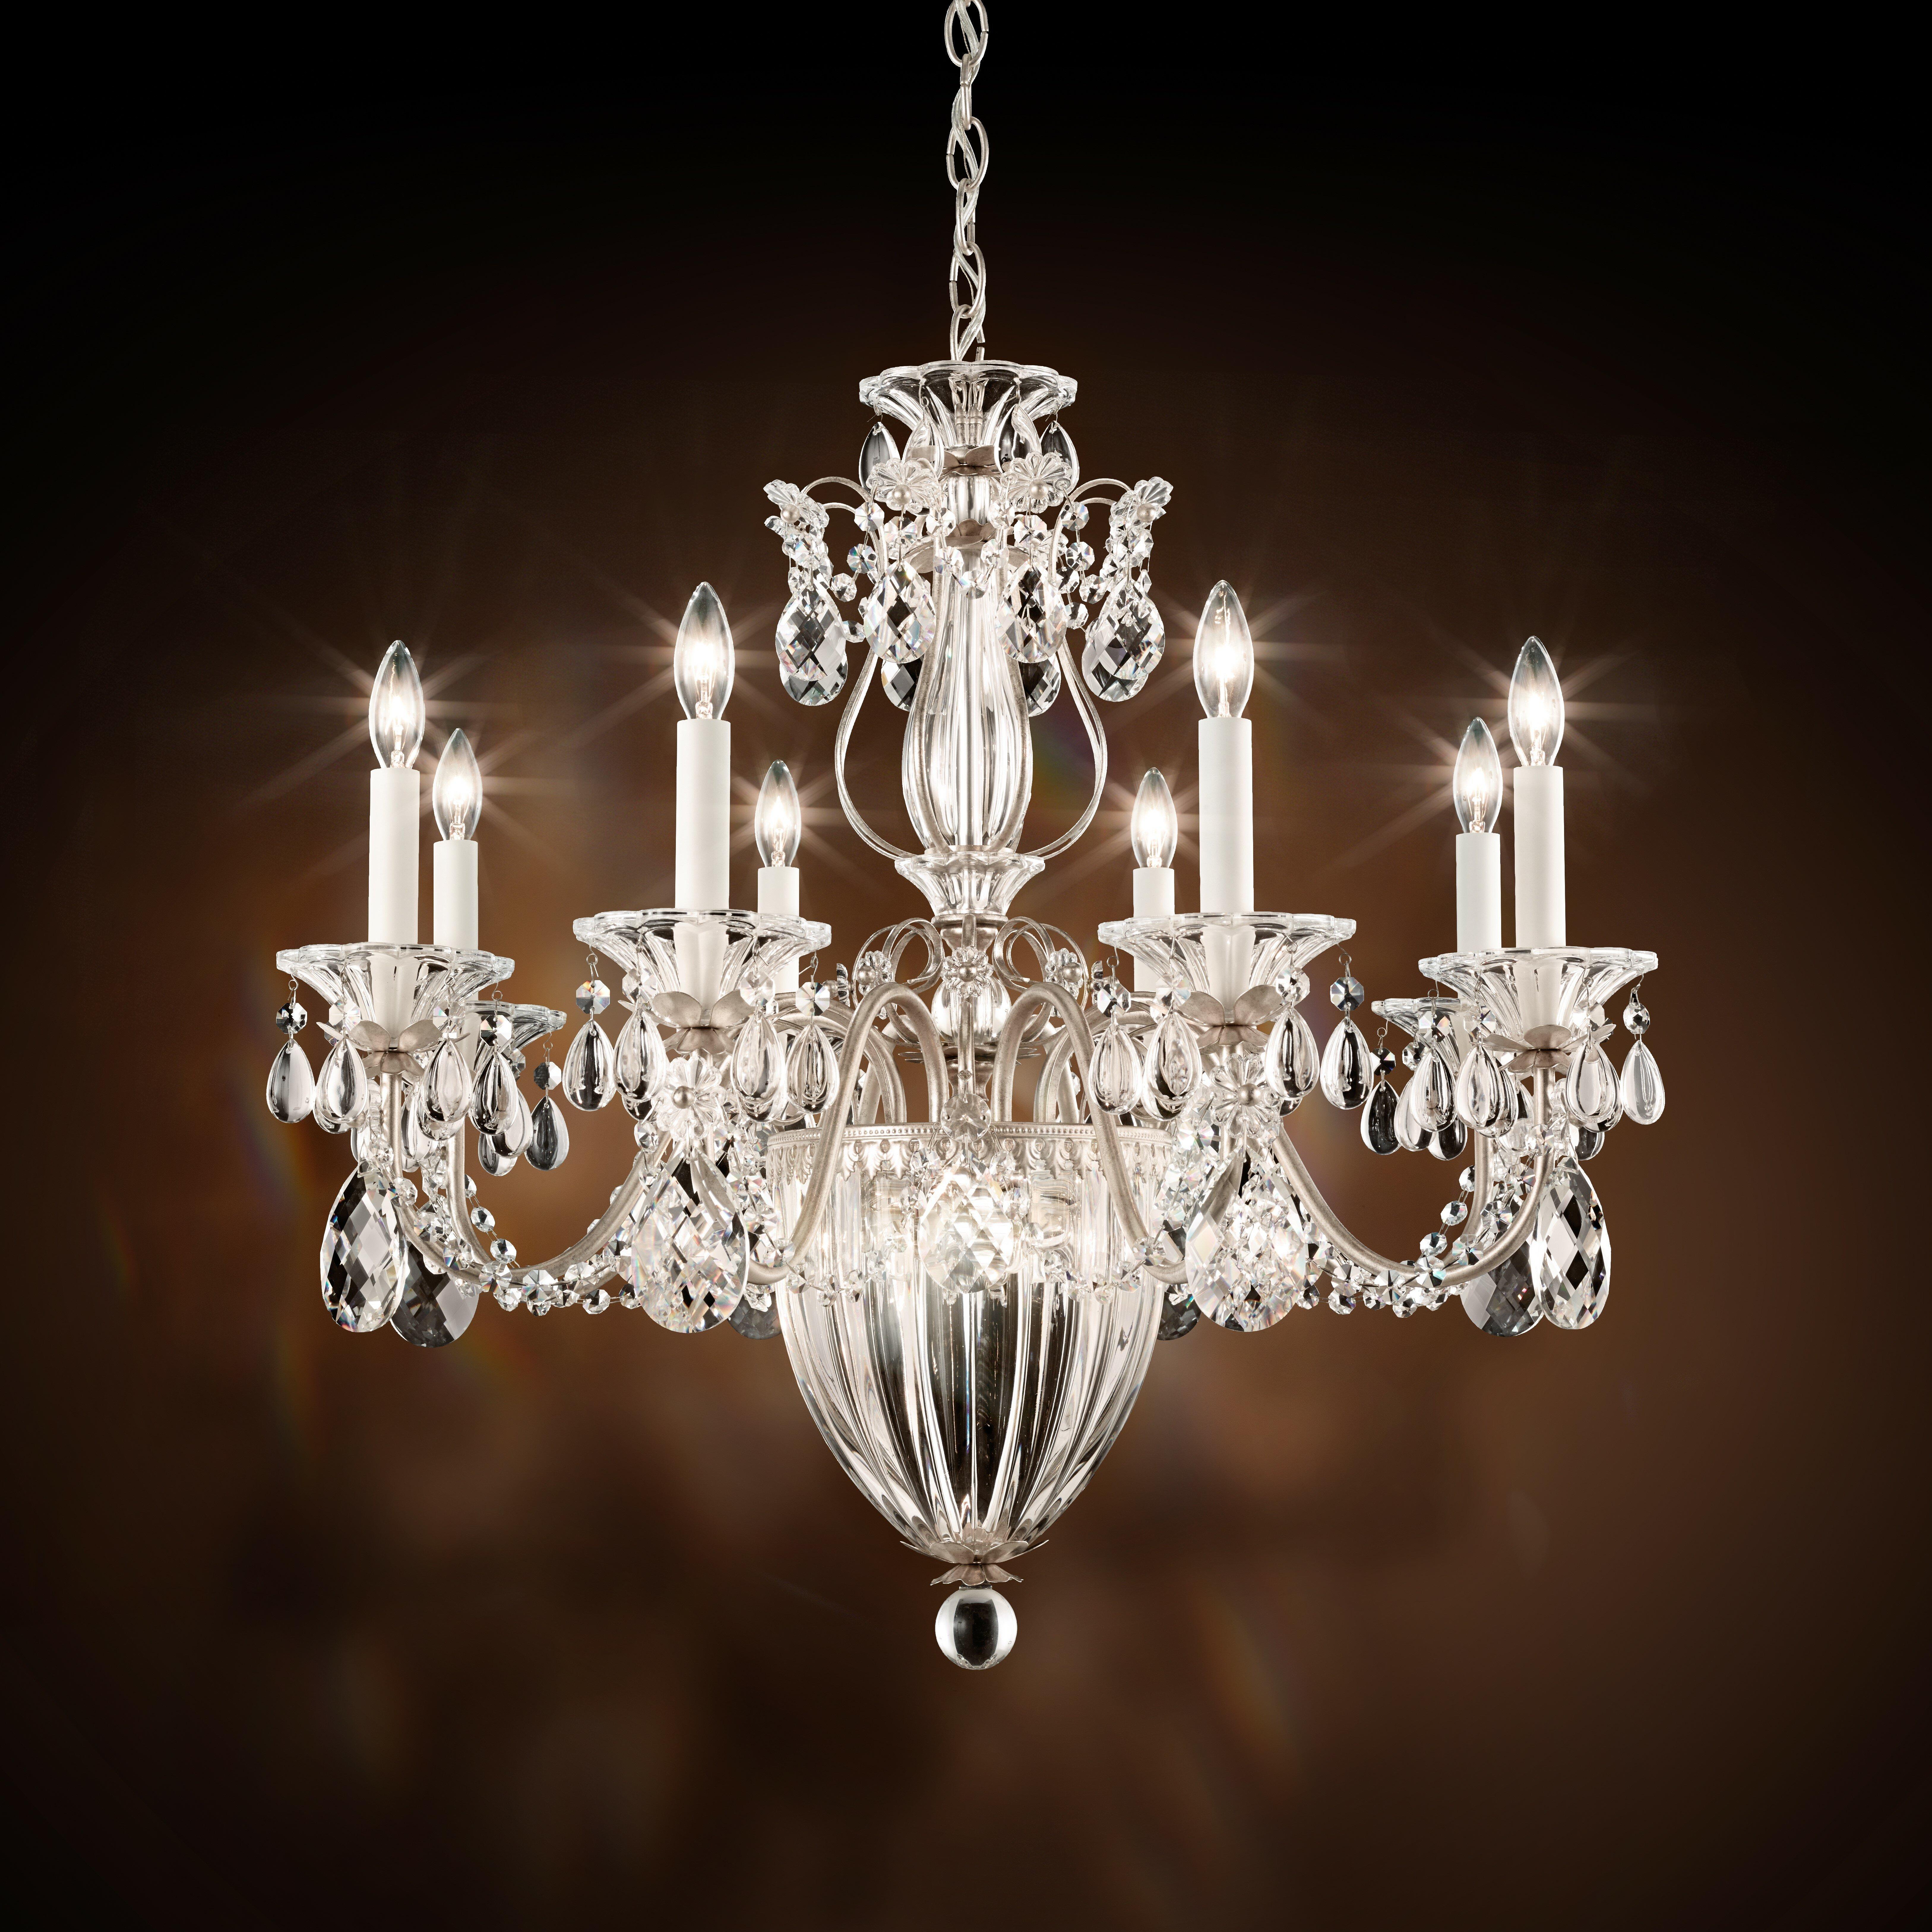 Schonbek wayfair bagatelle 8 light candle style chandelier arubaitofo Gallery